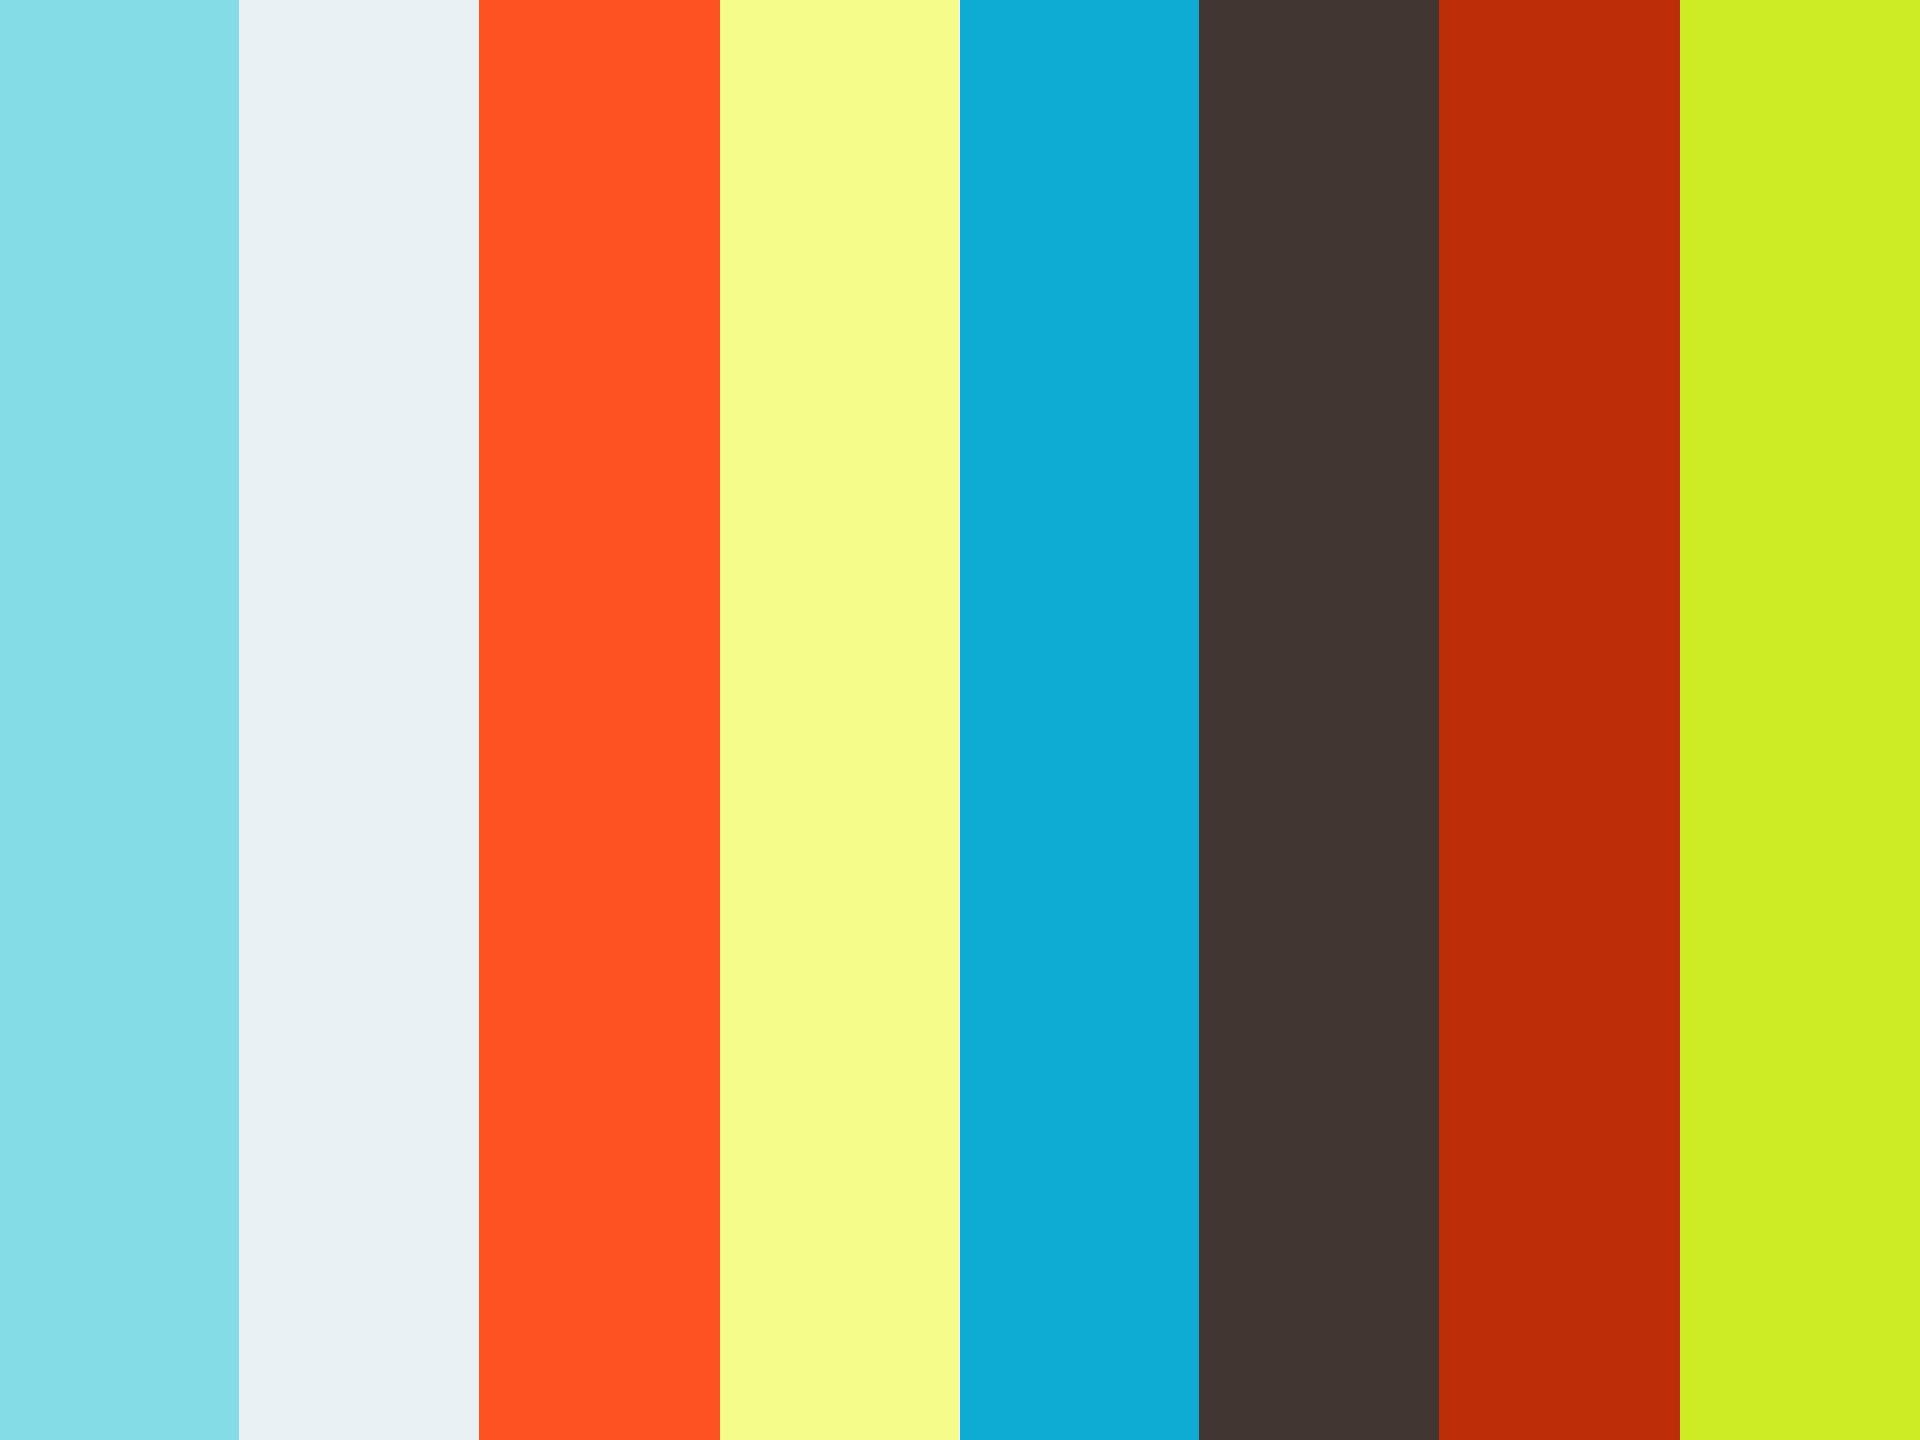 ar 15 cleaning diagram [ 1280 x 720 Pixel ]